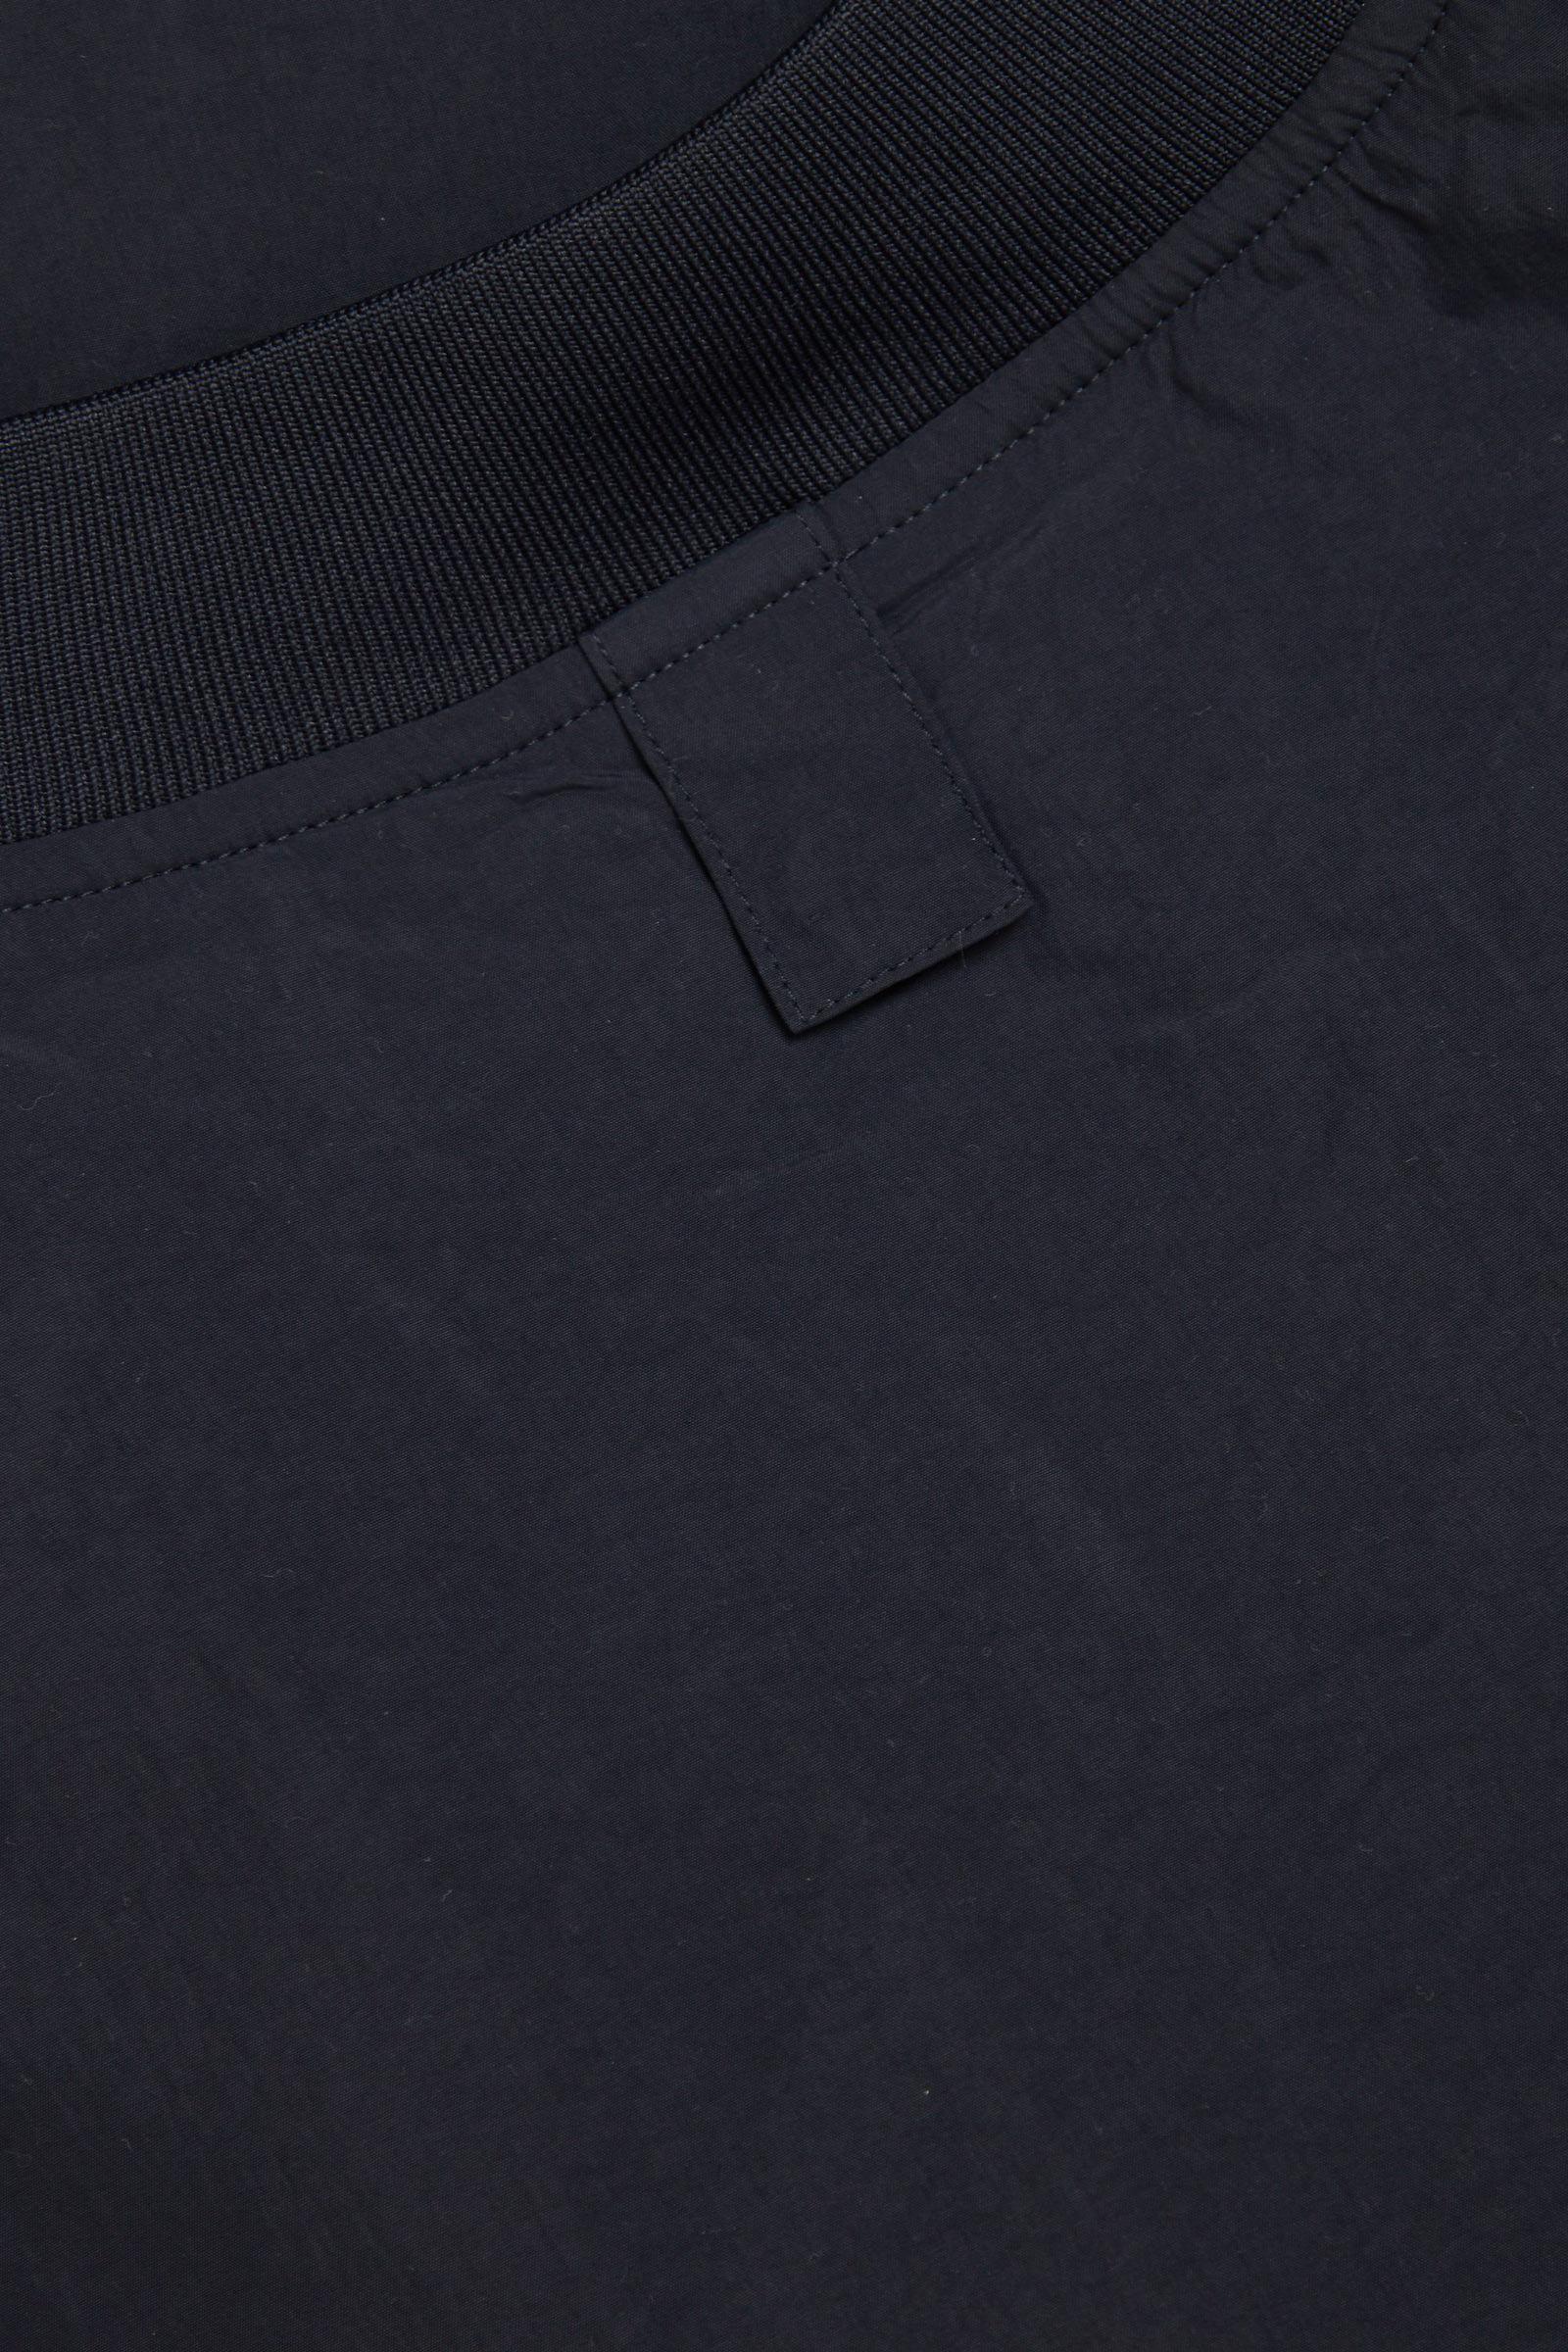 COS 다운 필드 패딩 베스트 라이너의 블루컬러 Detail입니다.